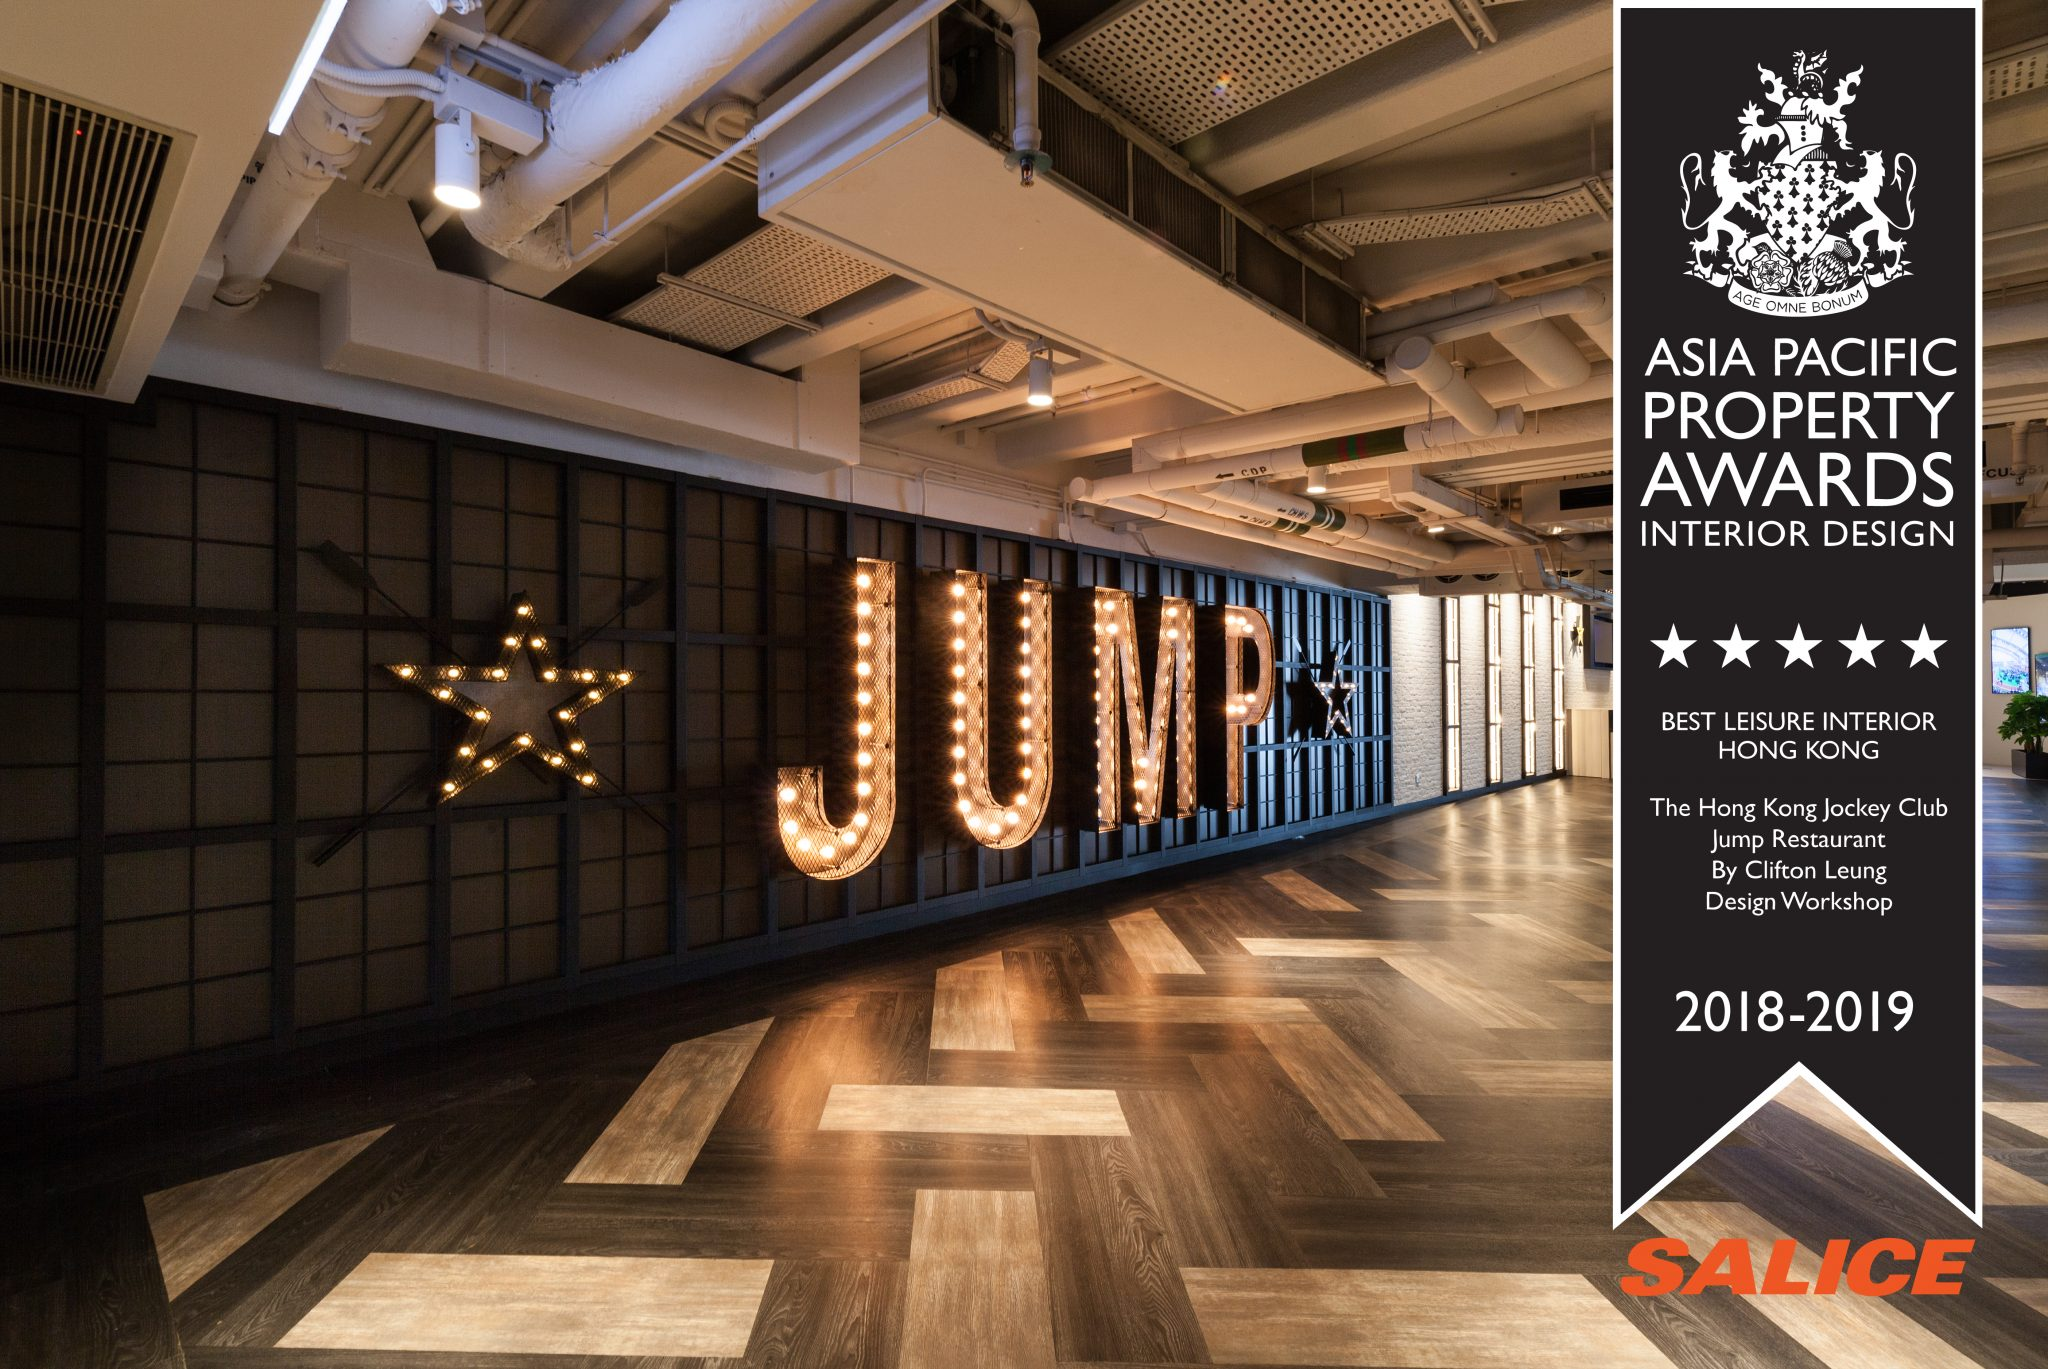 The hong kong jockey club jump restaurant was awarded